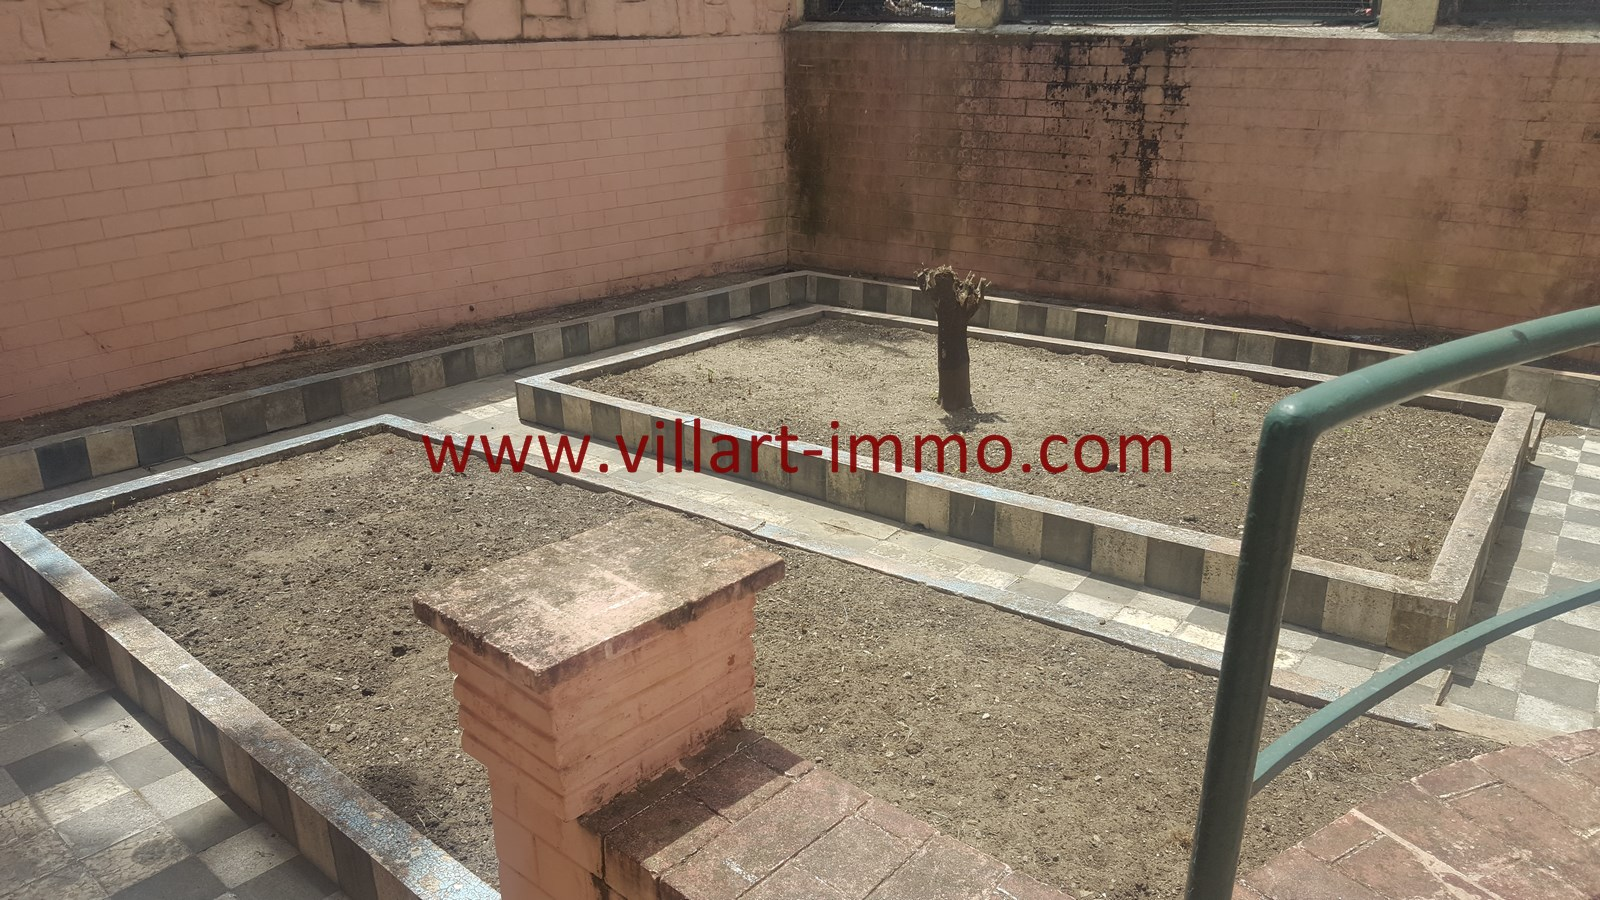 4-Vente-Maison-Tanger-Centre Ville-Jardin 3-VM499-Villart Immo